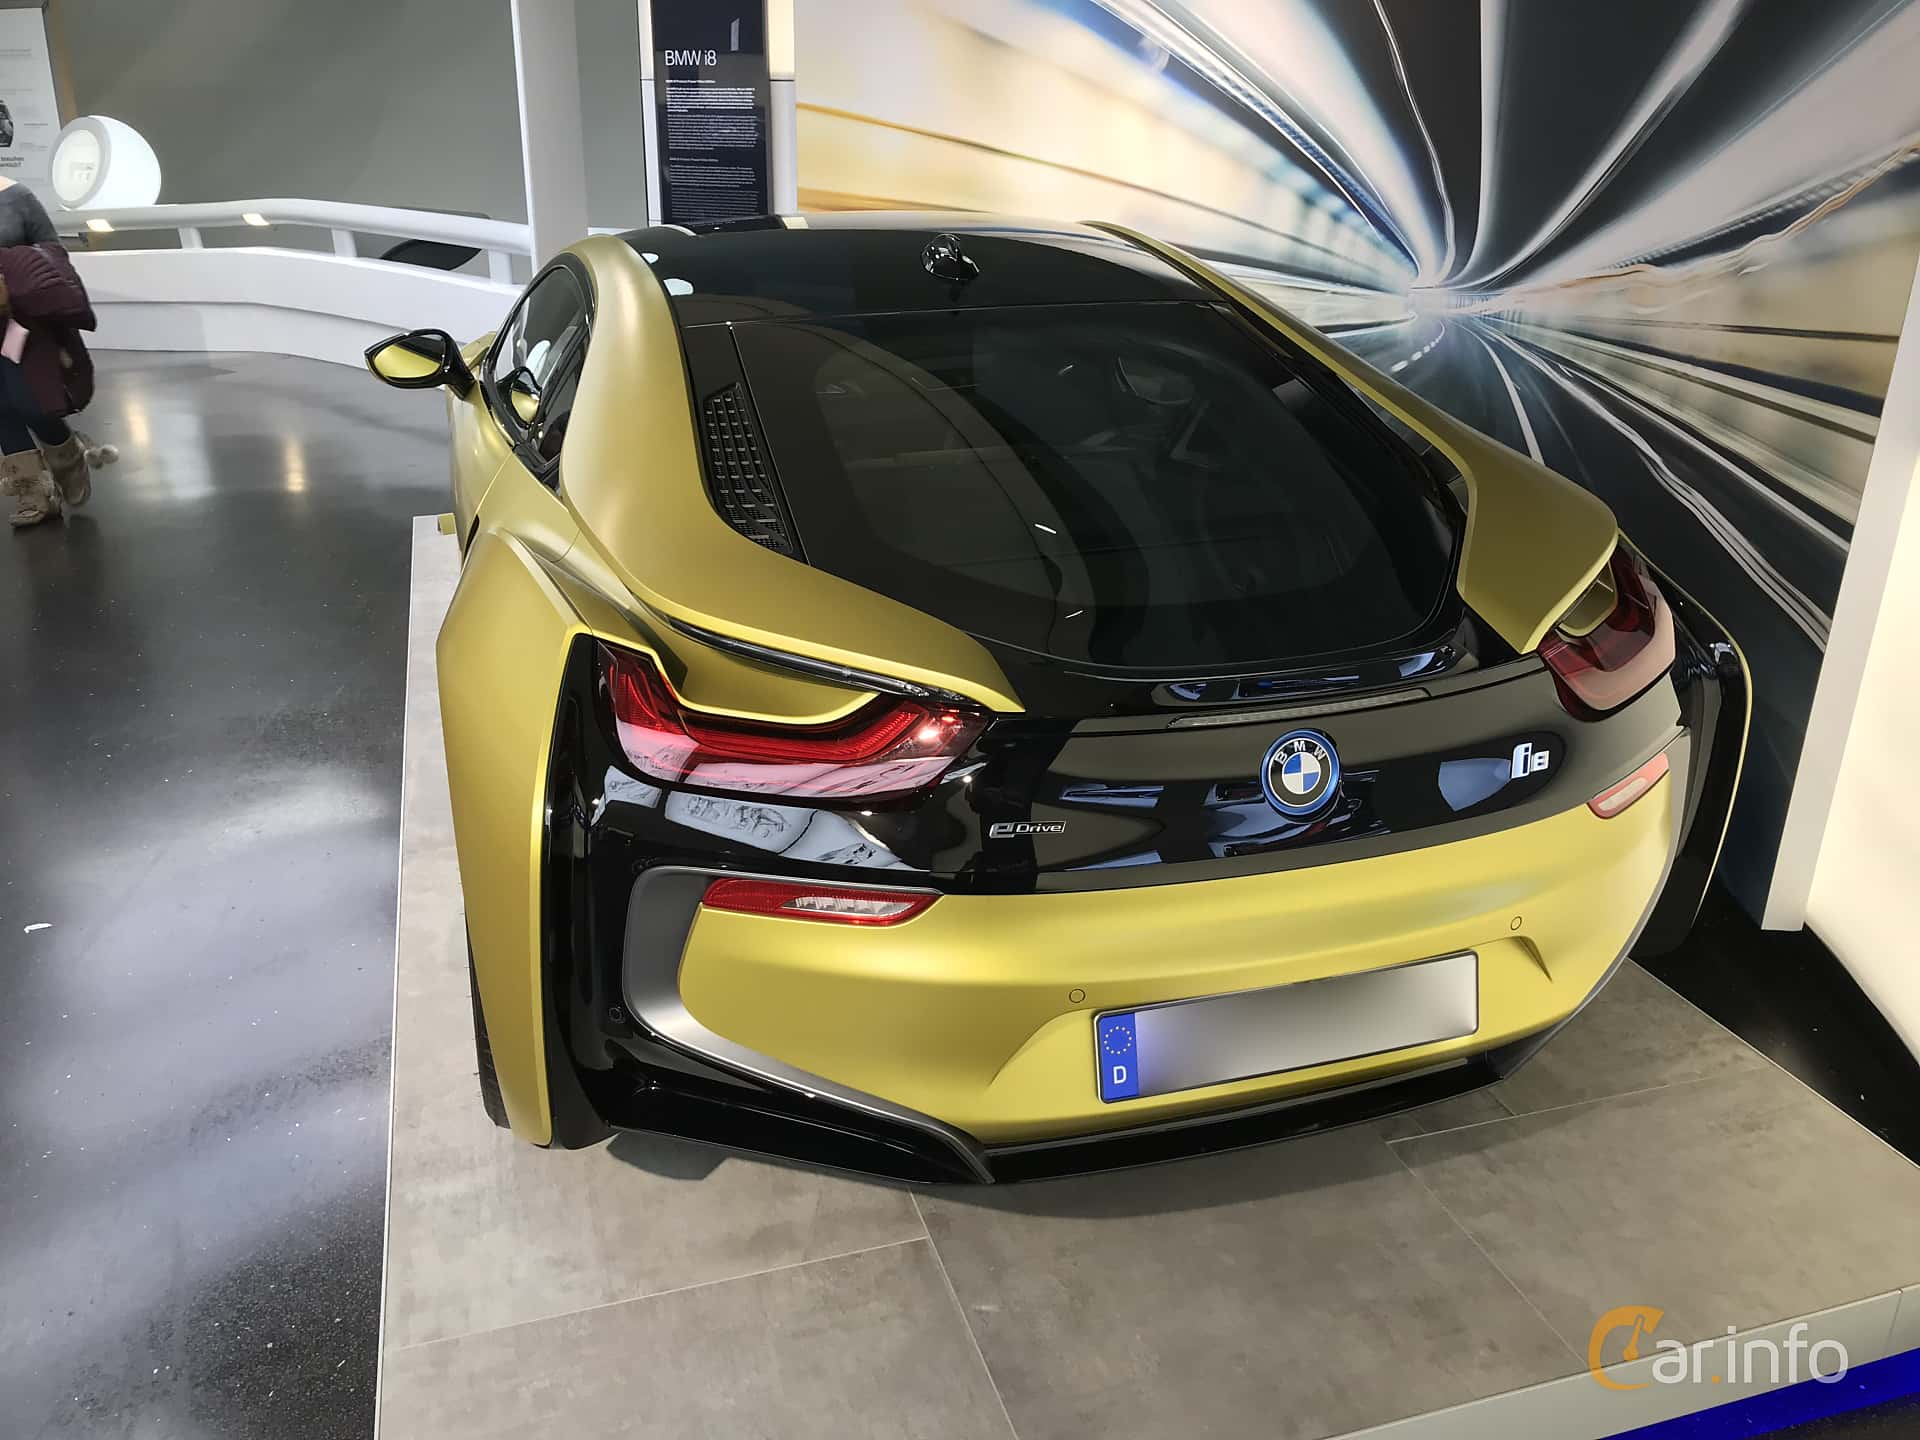 BMW i8 1.5 + 7.1 kWh Steptronic, 362hp, 2014